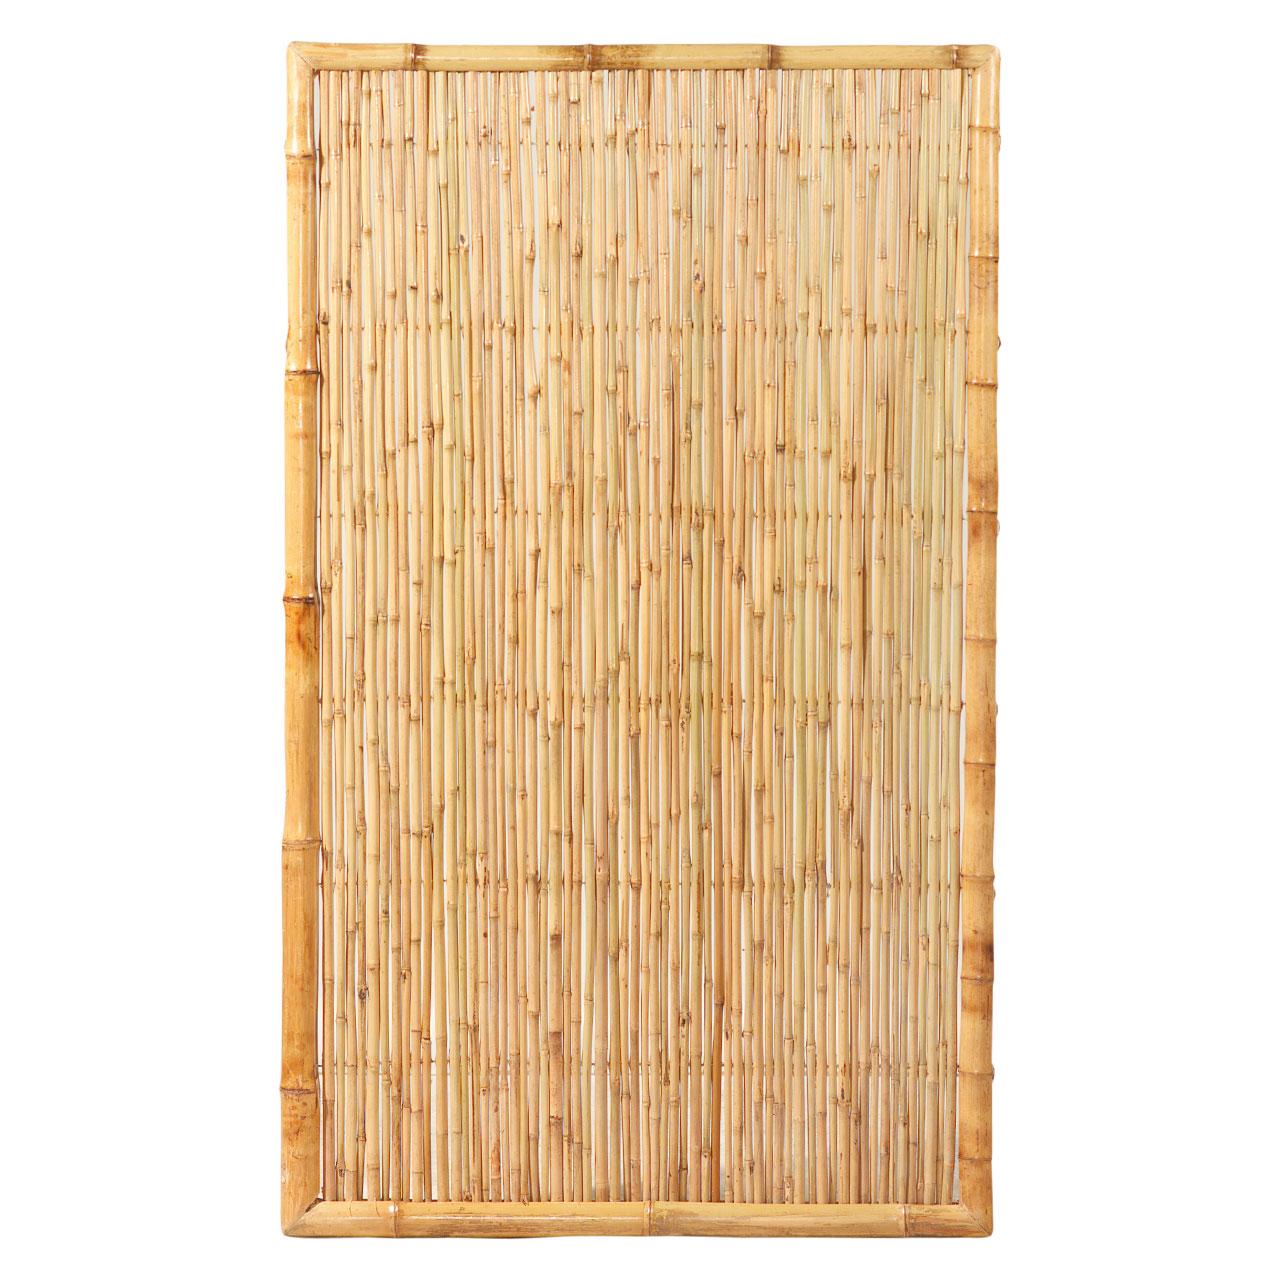 Full Size of Paravent Bambus Balkon Sichtschutzwand Bett Garten Wohnzimmer Paravent Bambus Balkon